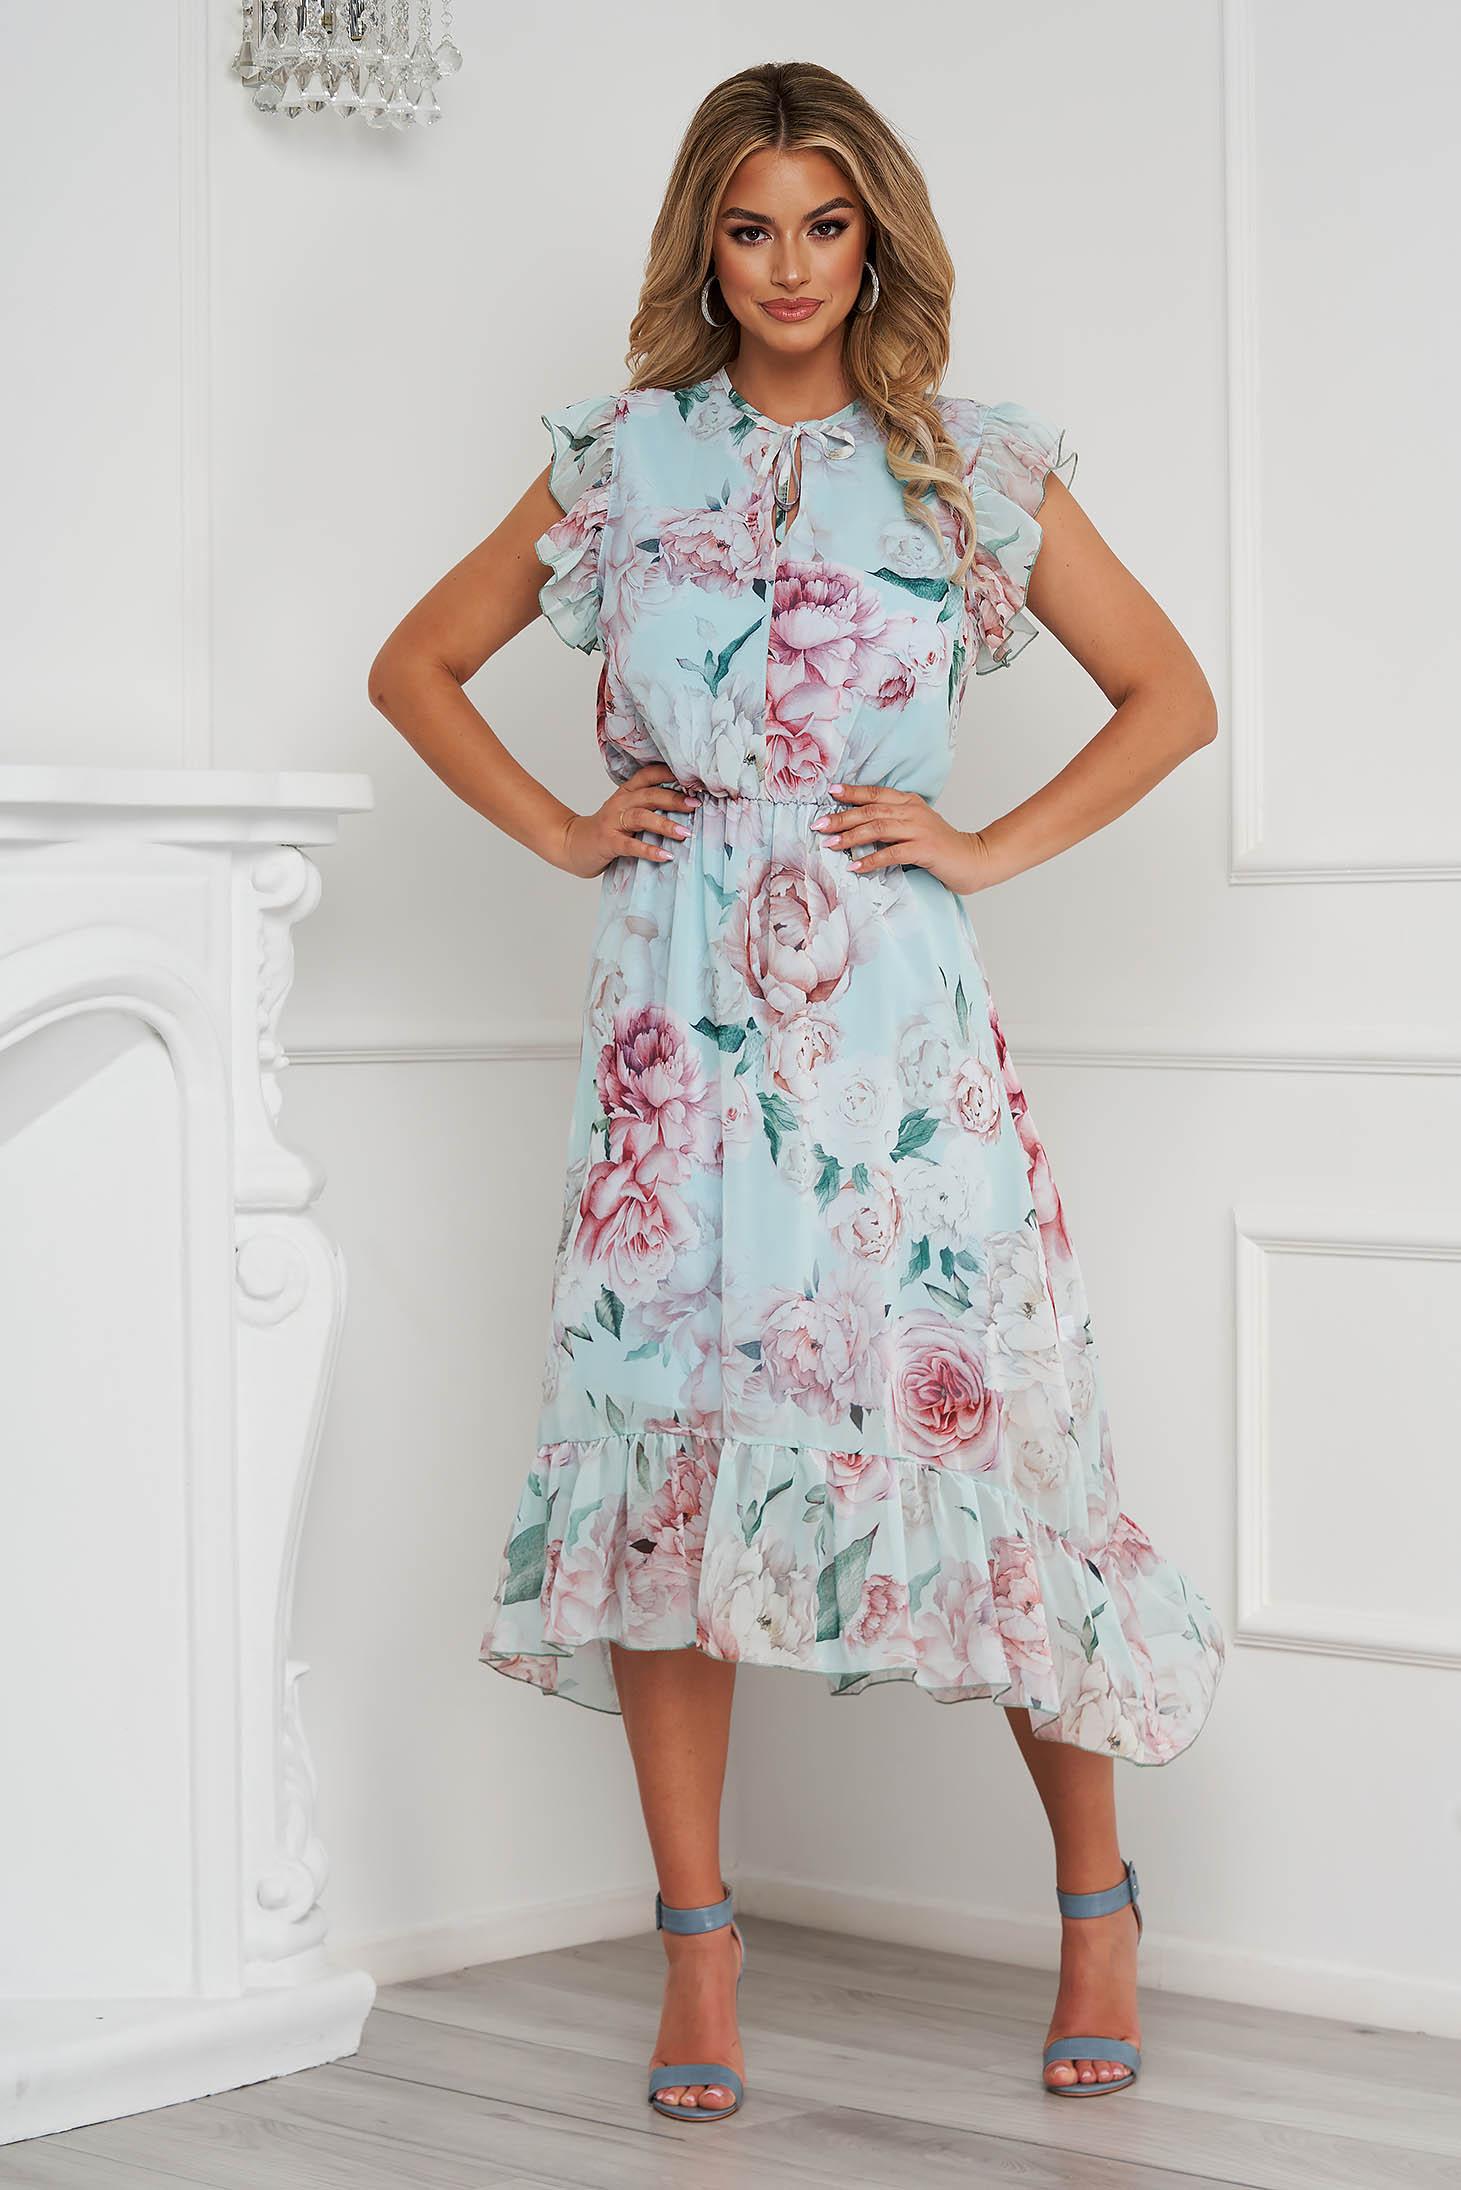 Dress midi asymmetrical cloche airy fabric with ruffled sleeves